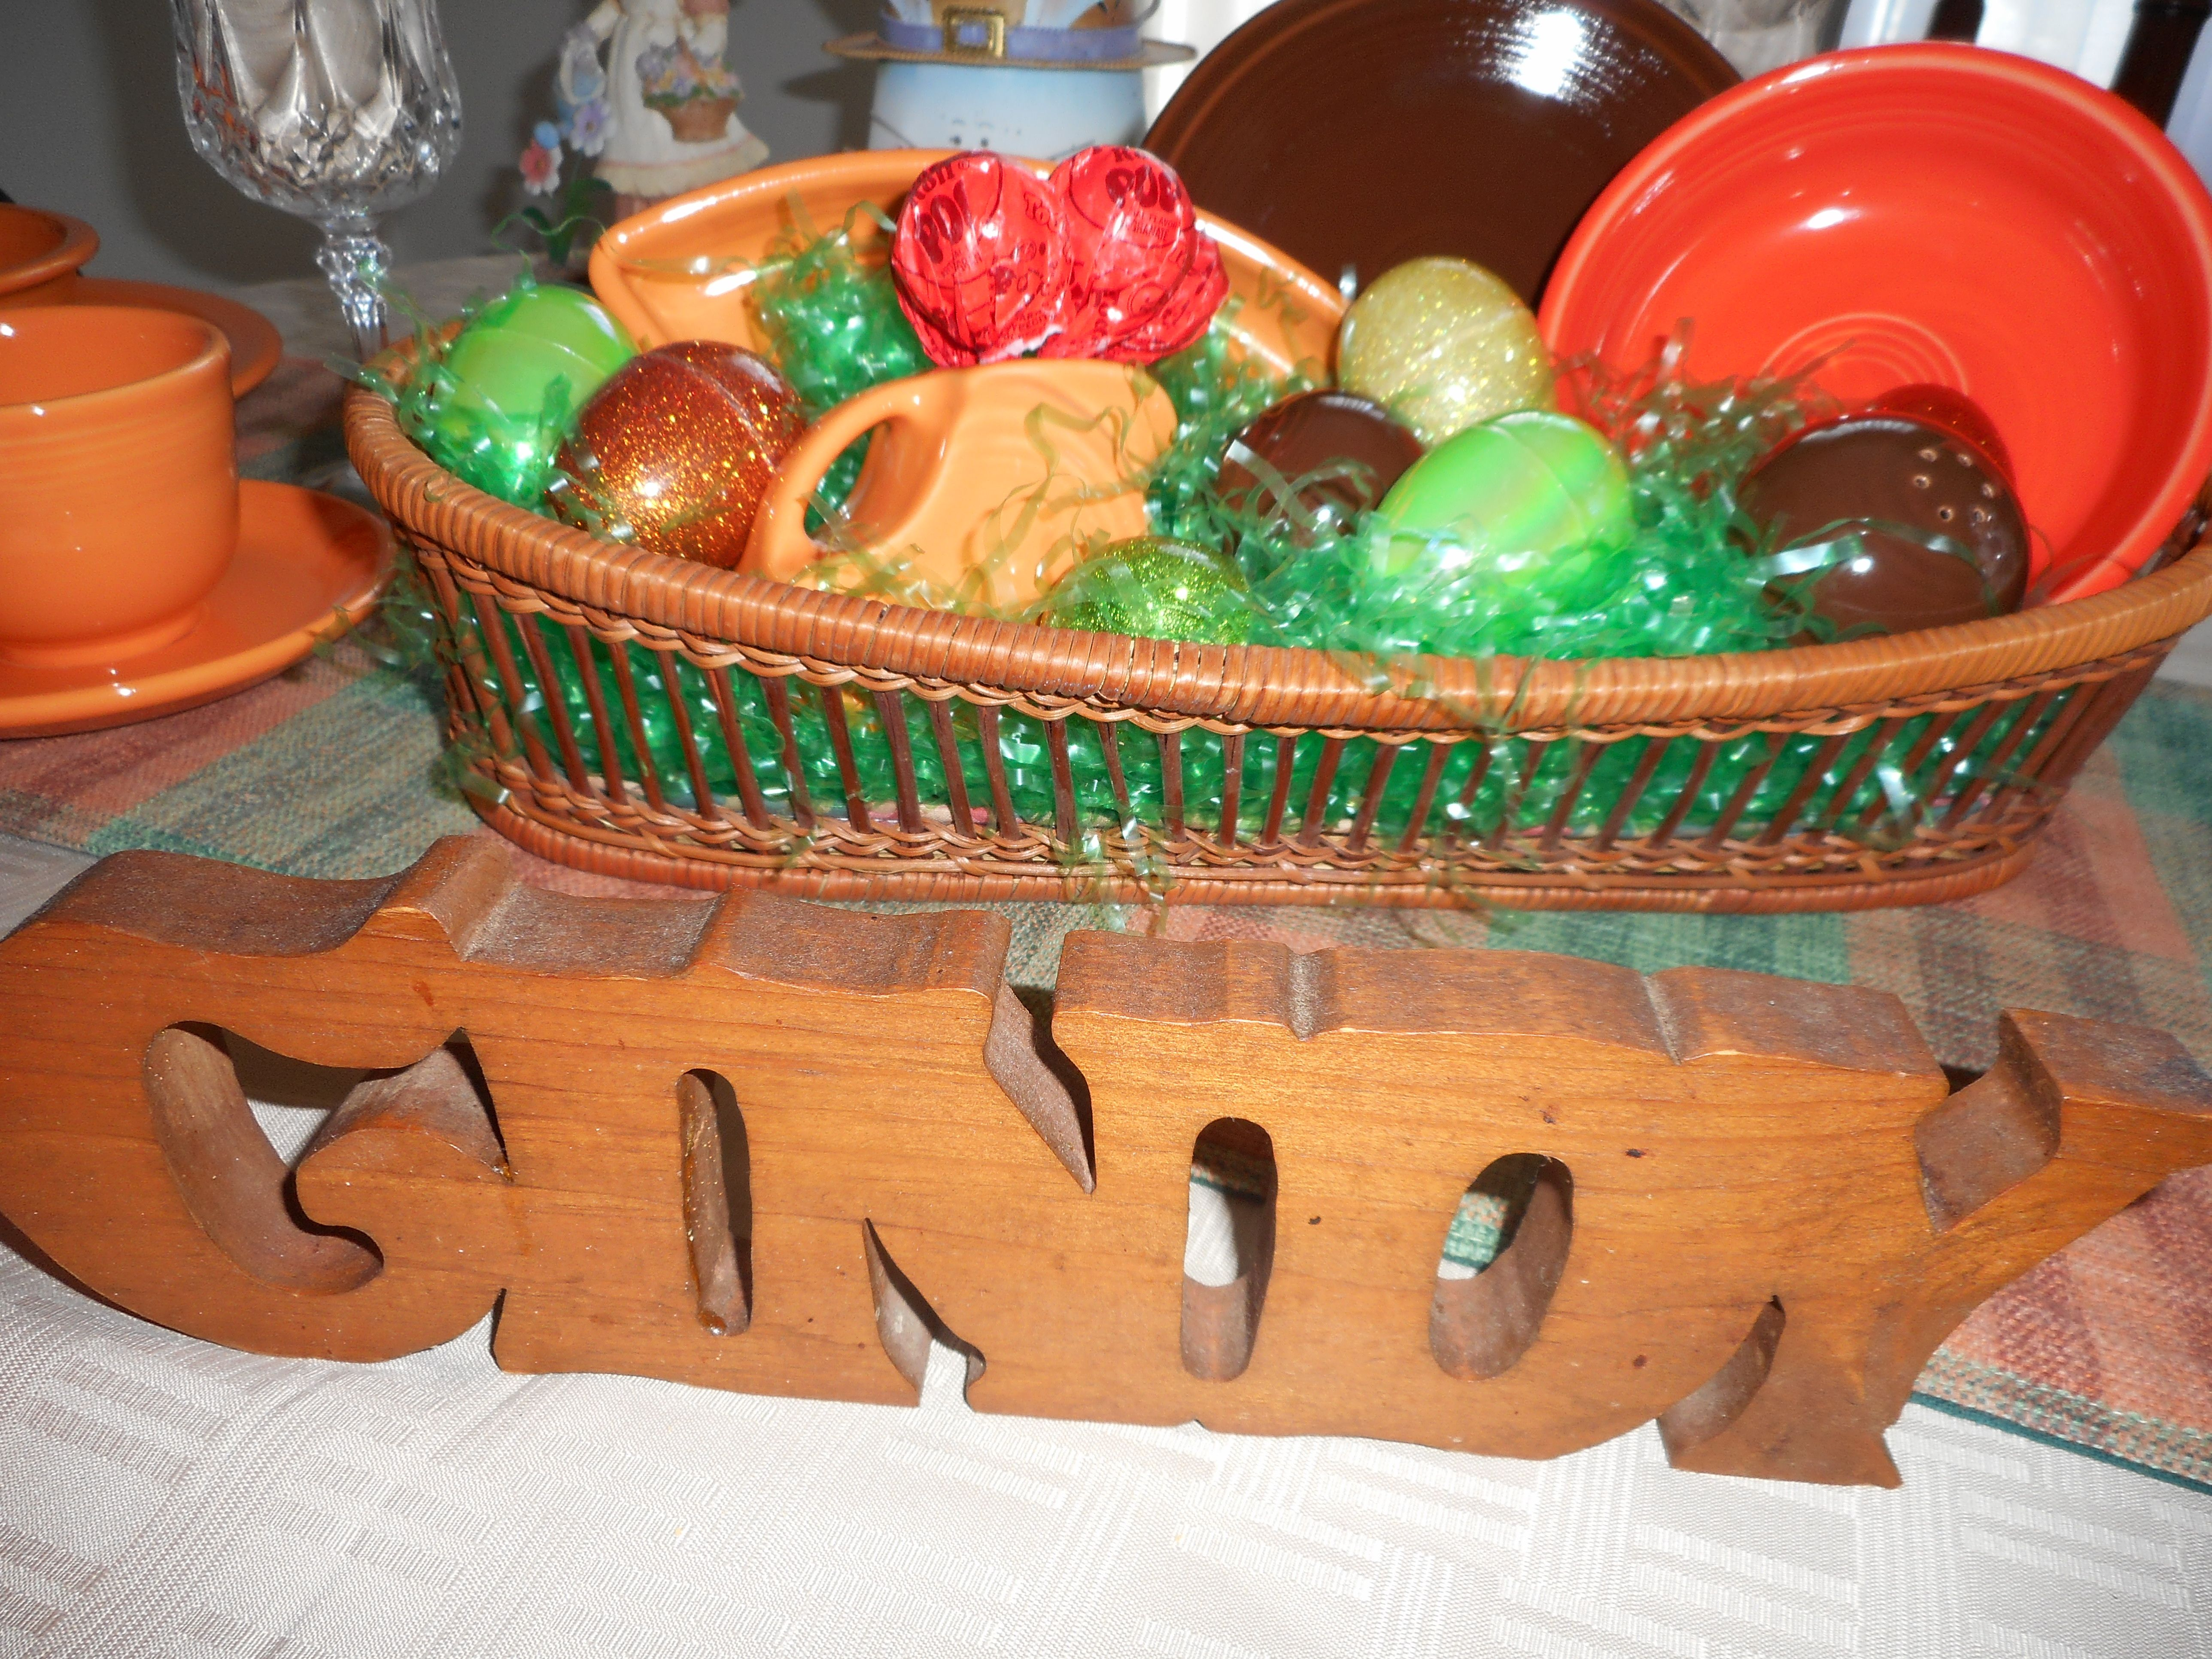 Cindy's fiesta centerpiece